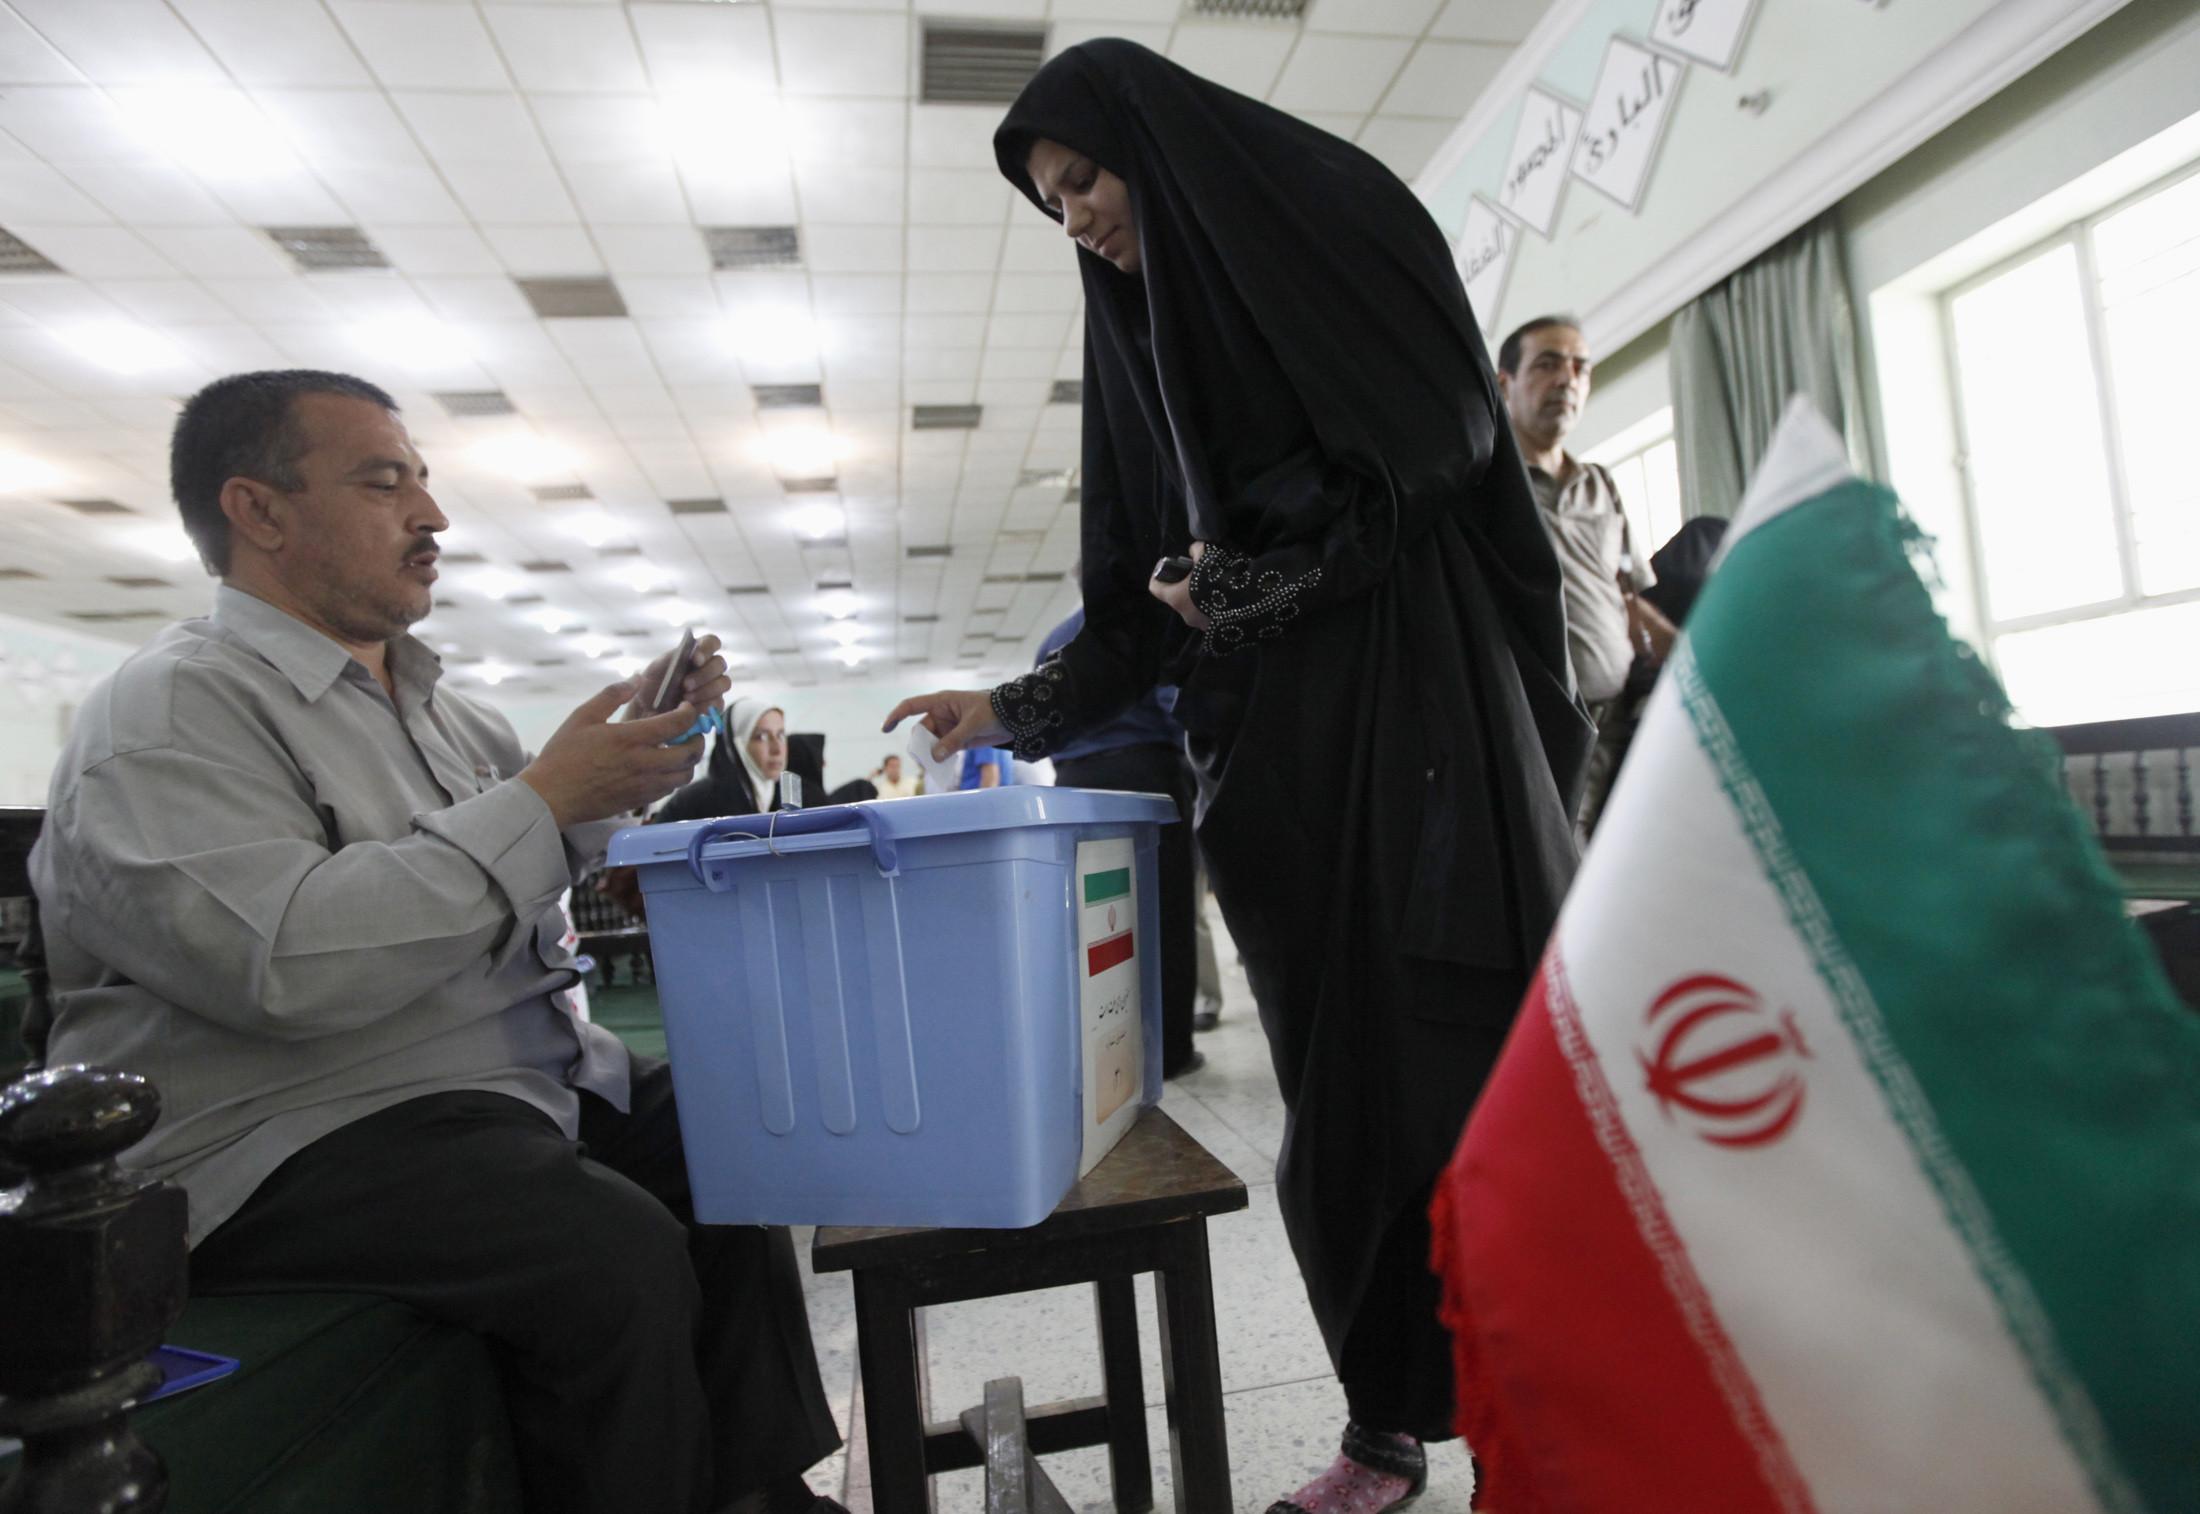 Хасан Рухани стал кандидатом впрезиденты Ирана